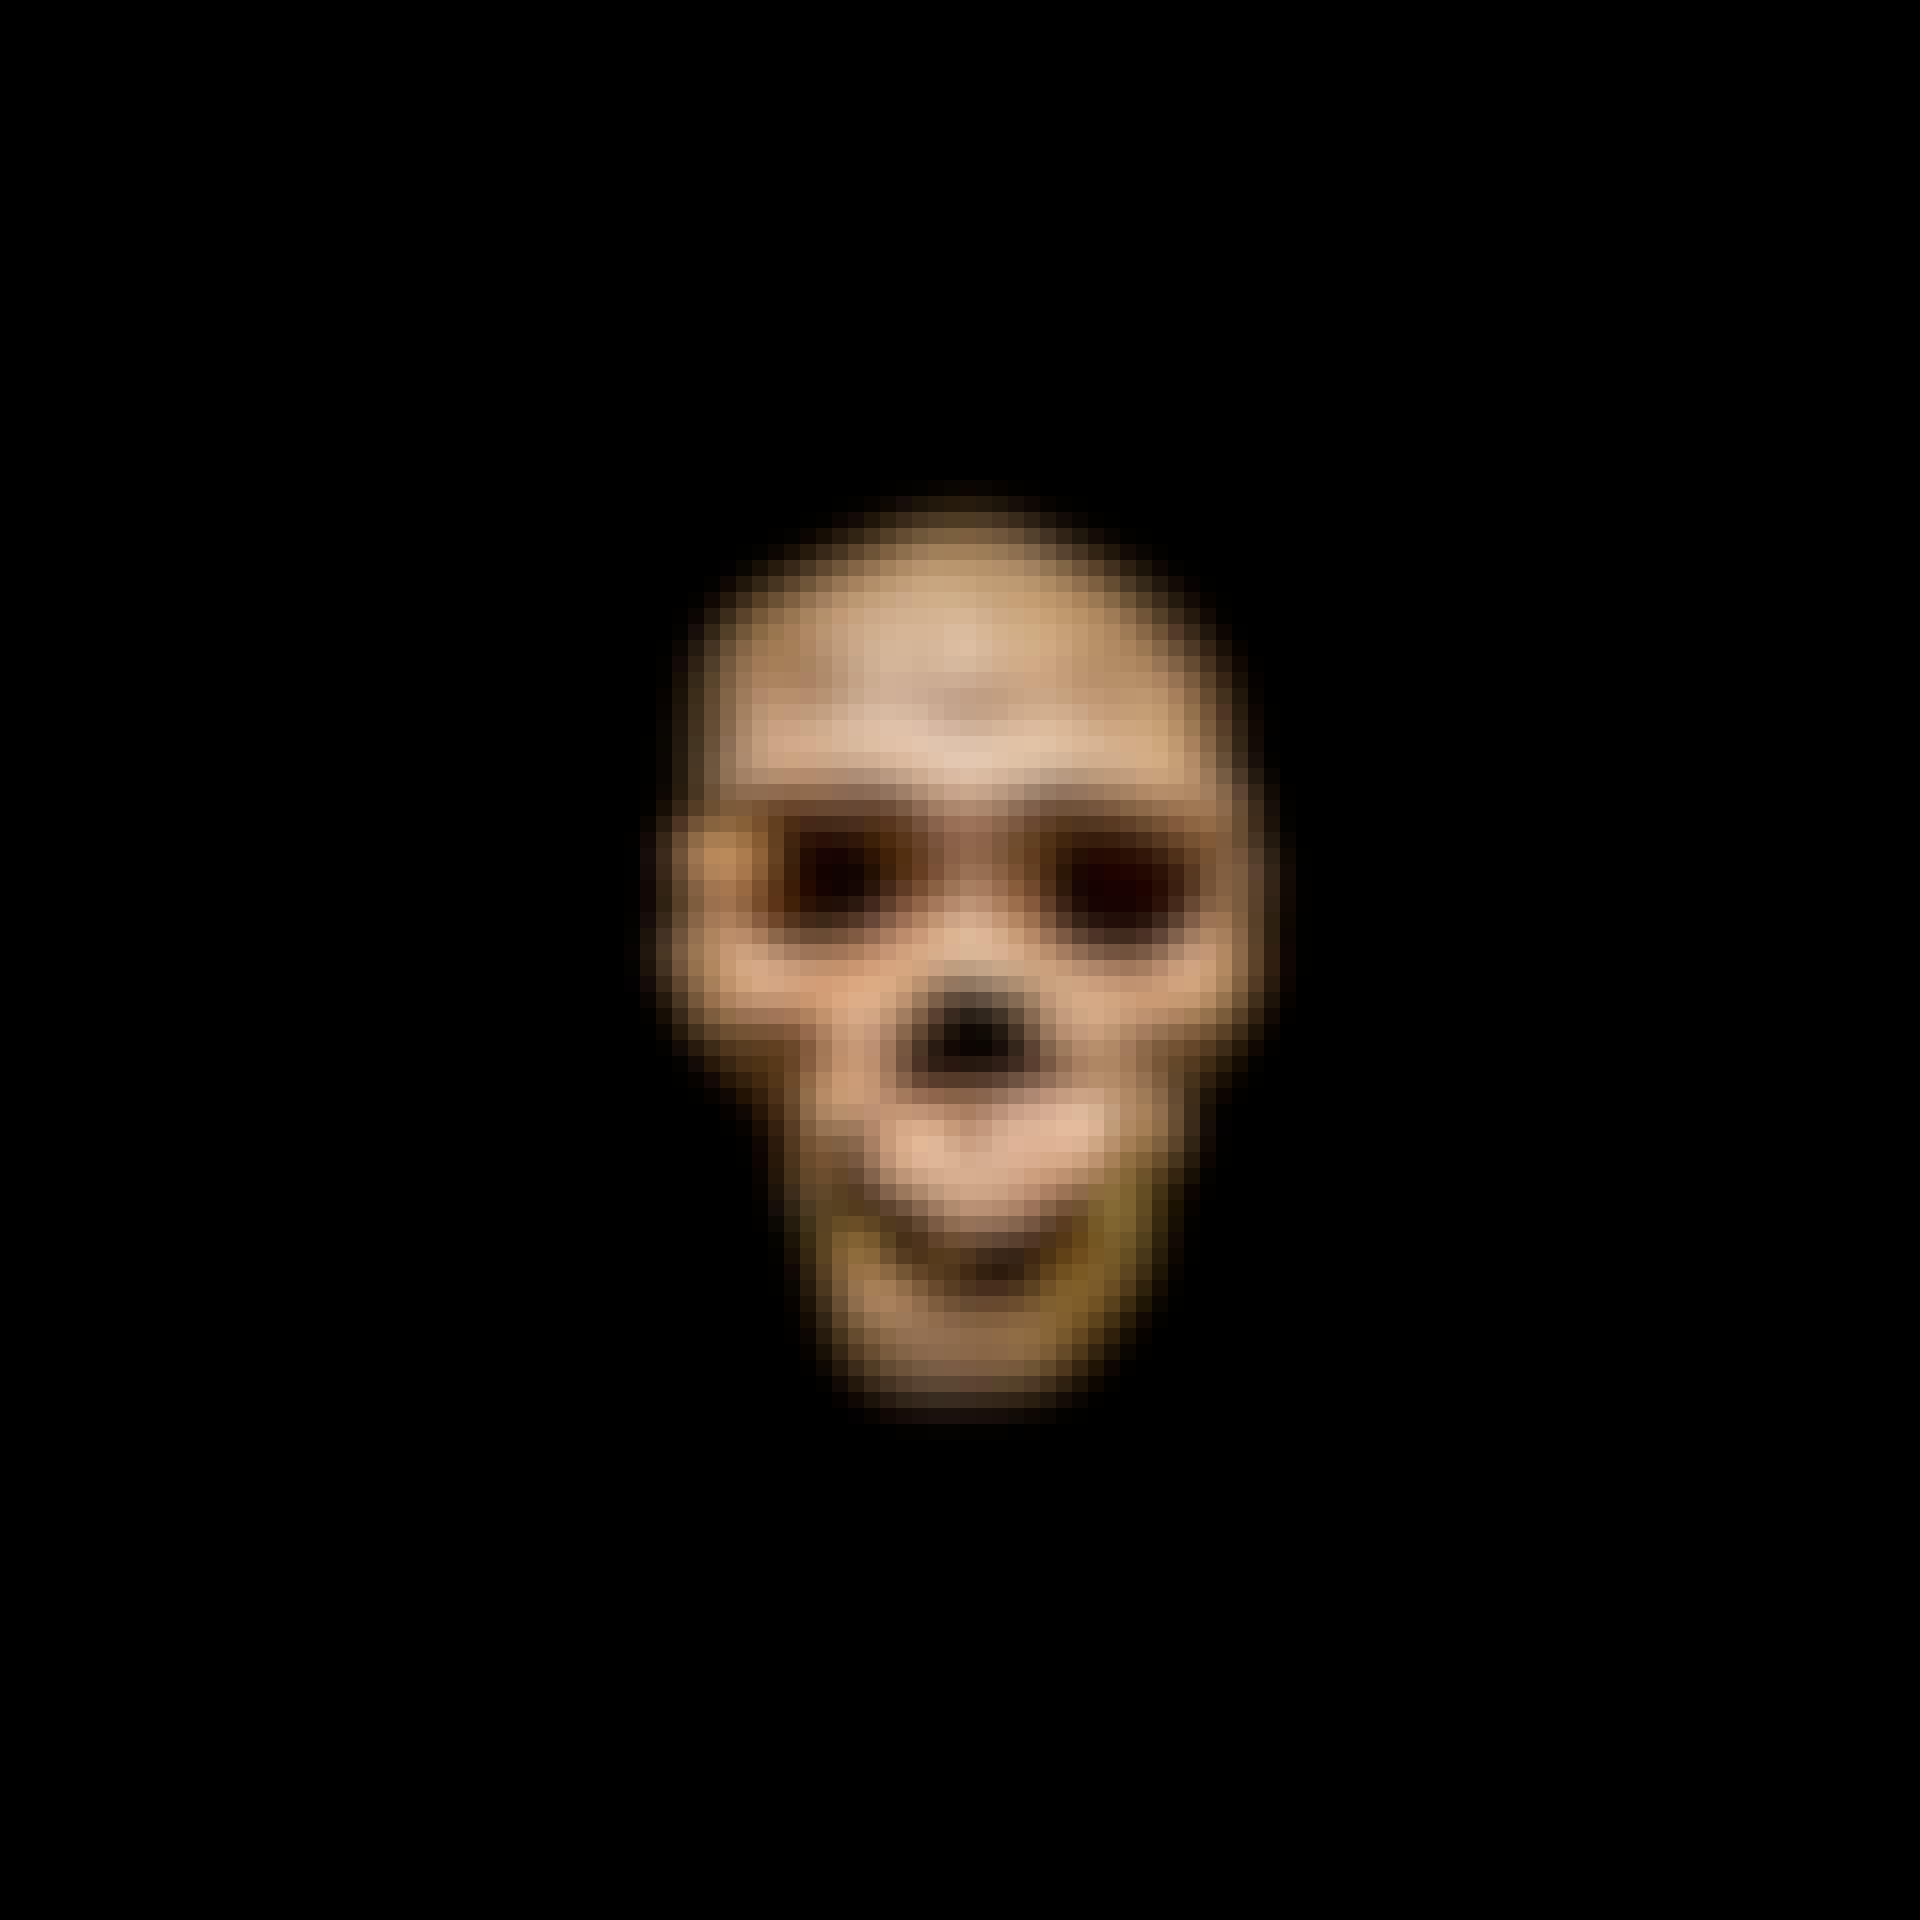 Fossil af Homo heidelbergensis' kranie.